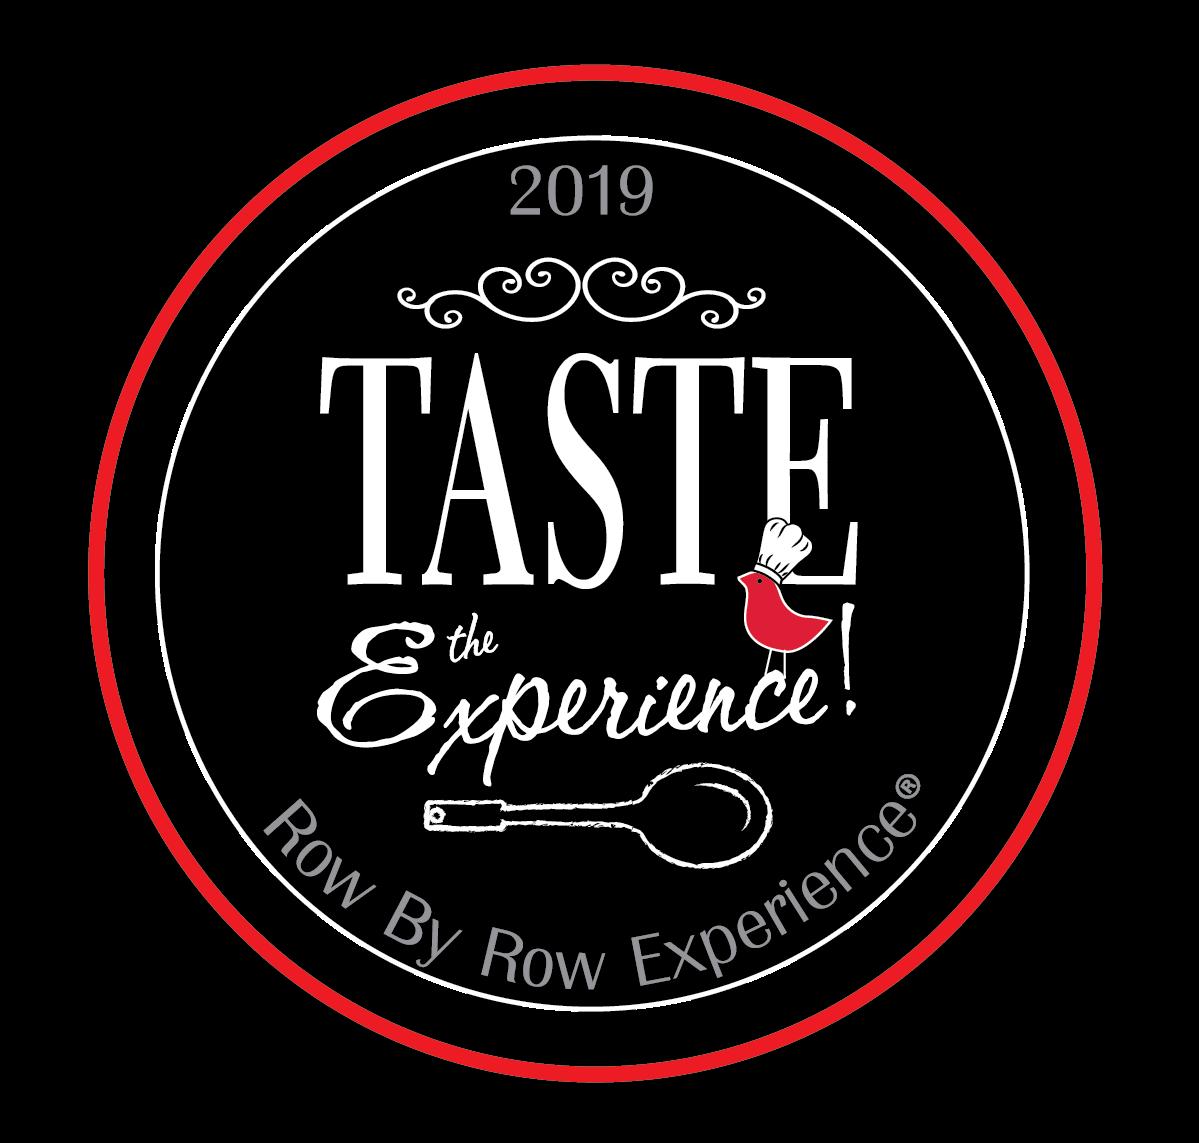 2019 Row by Row Experience